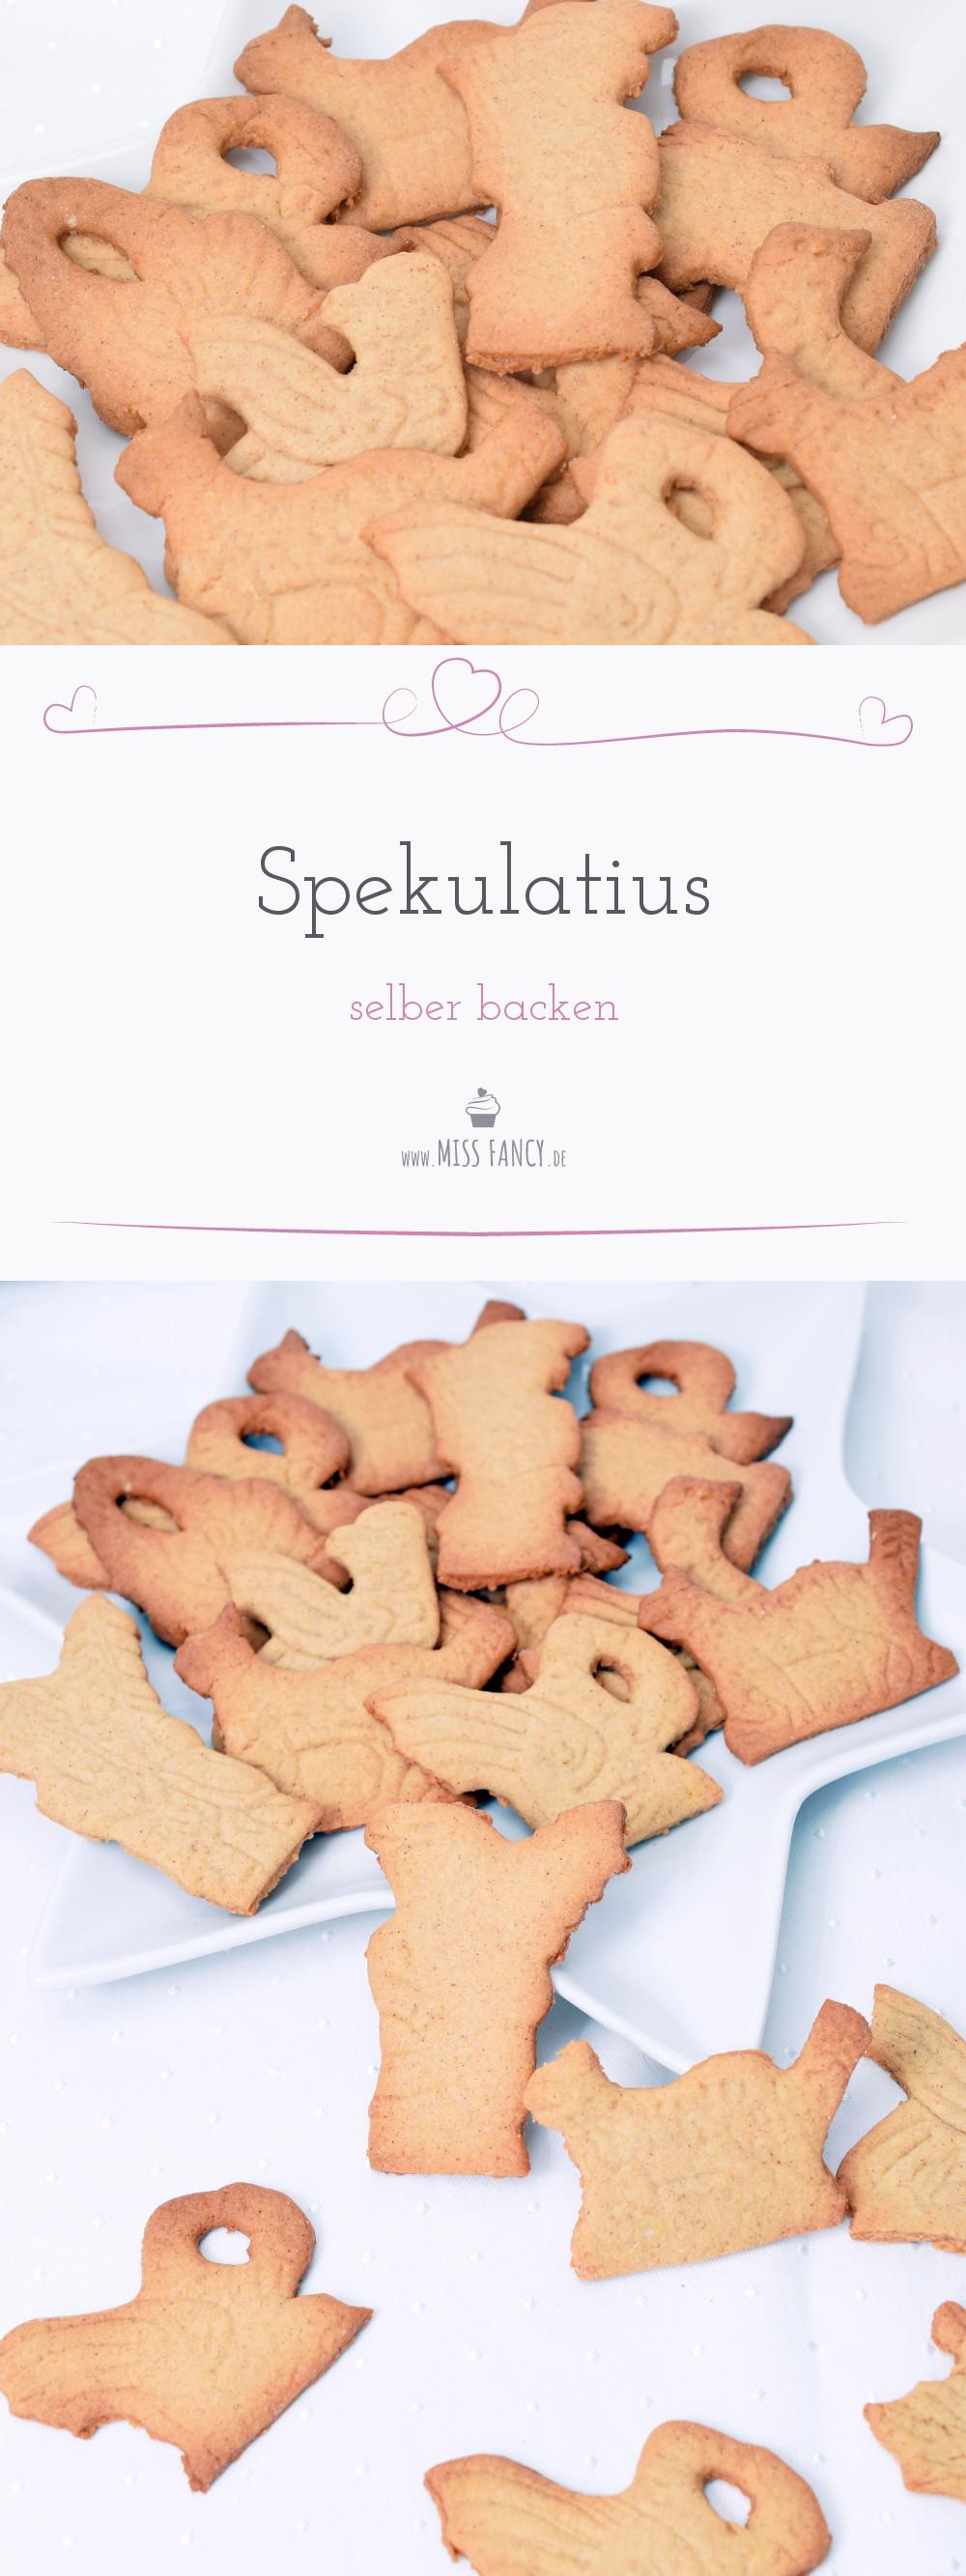 Rezept-Spekulatius-selbst-backen